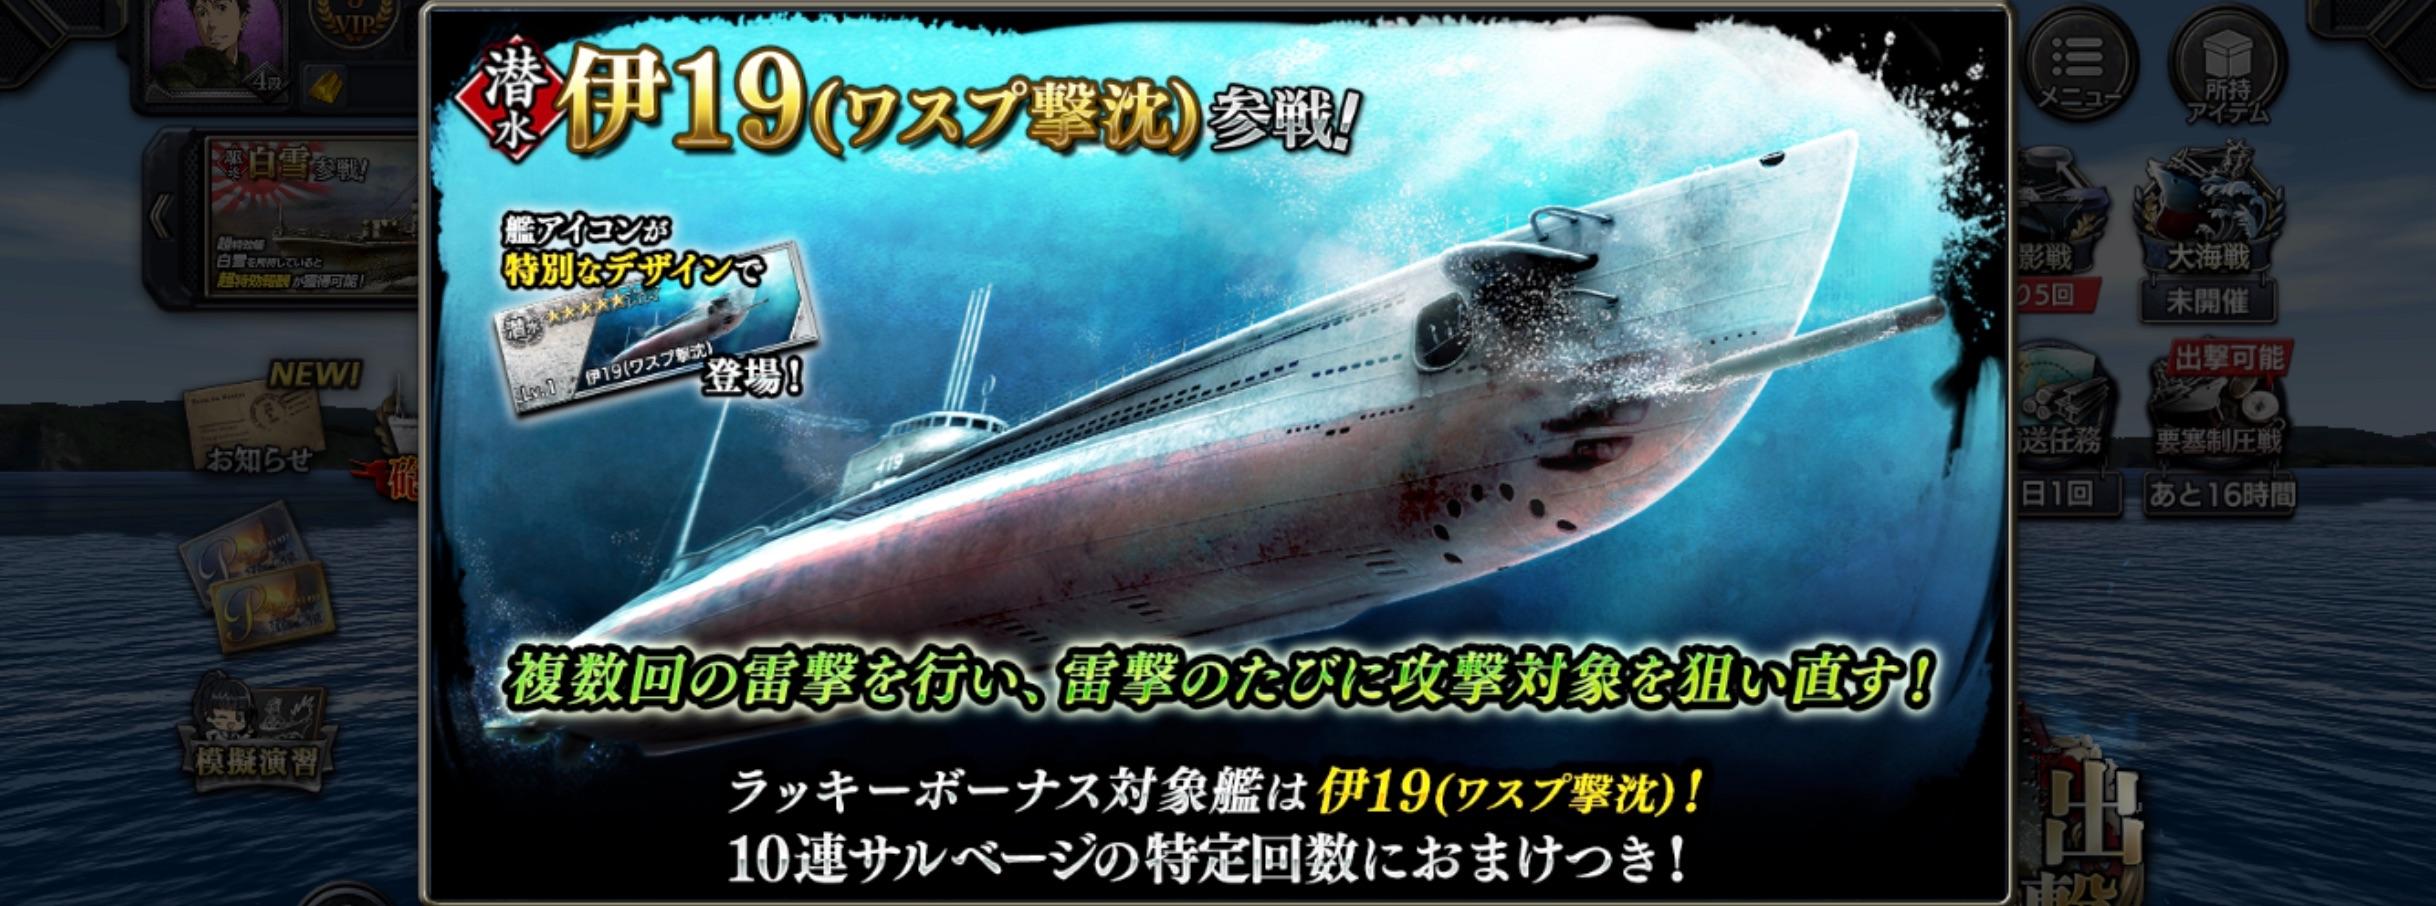 souen-submarine:i19